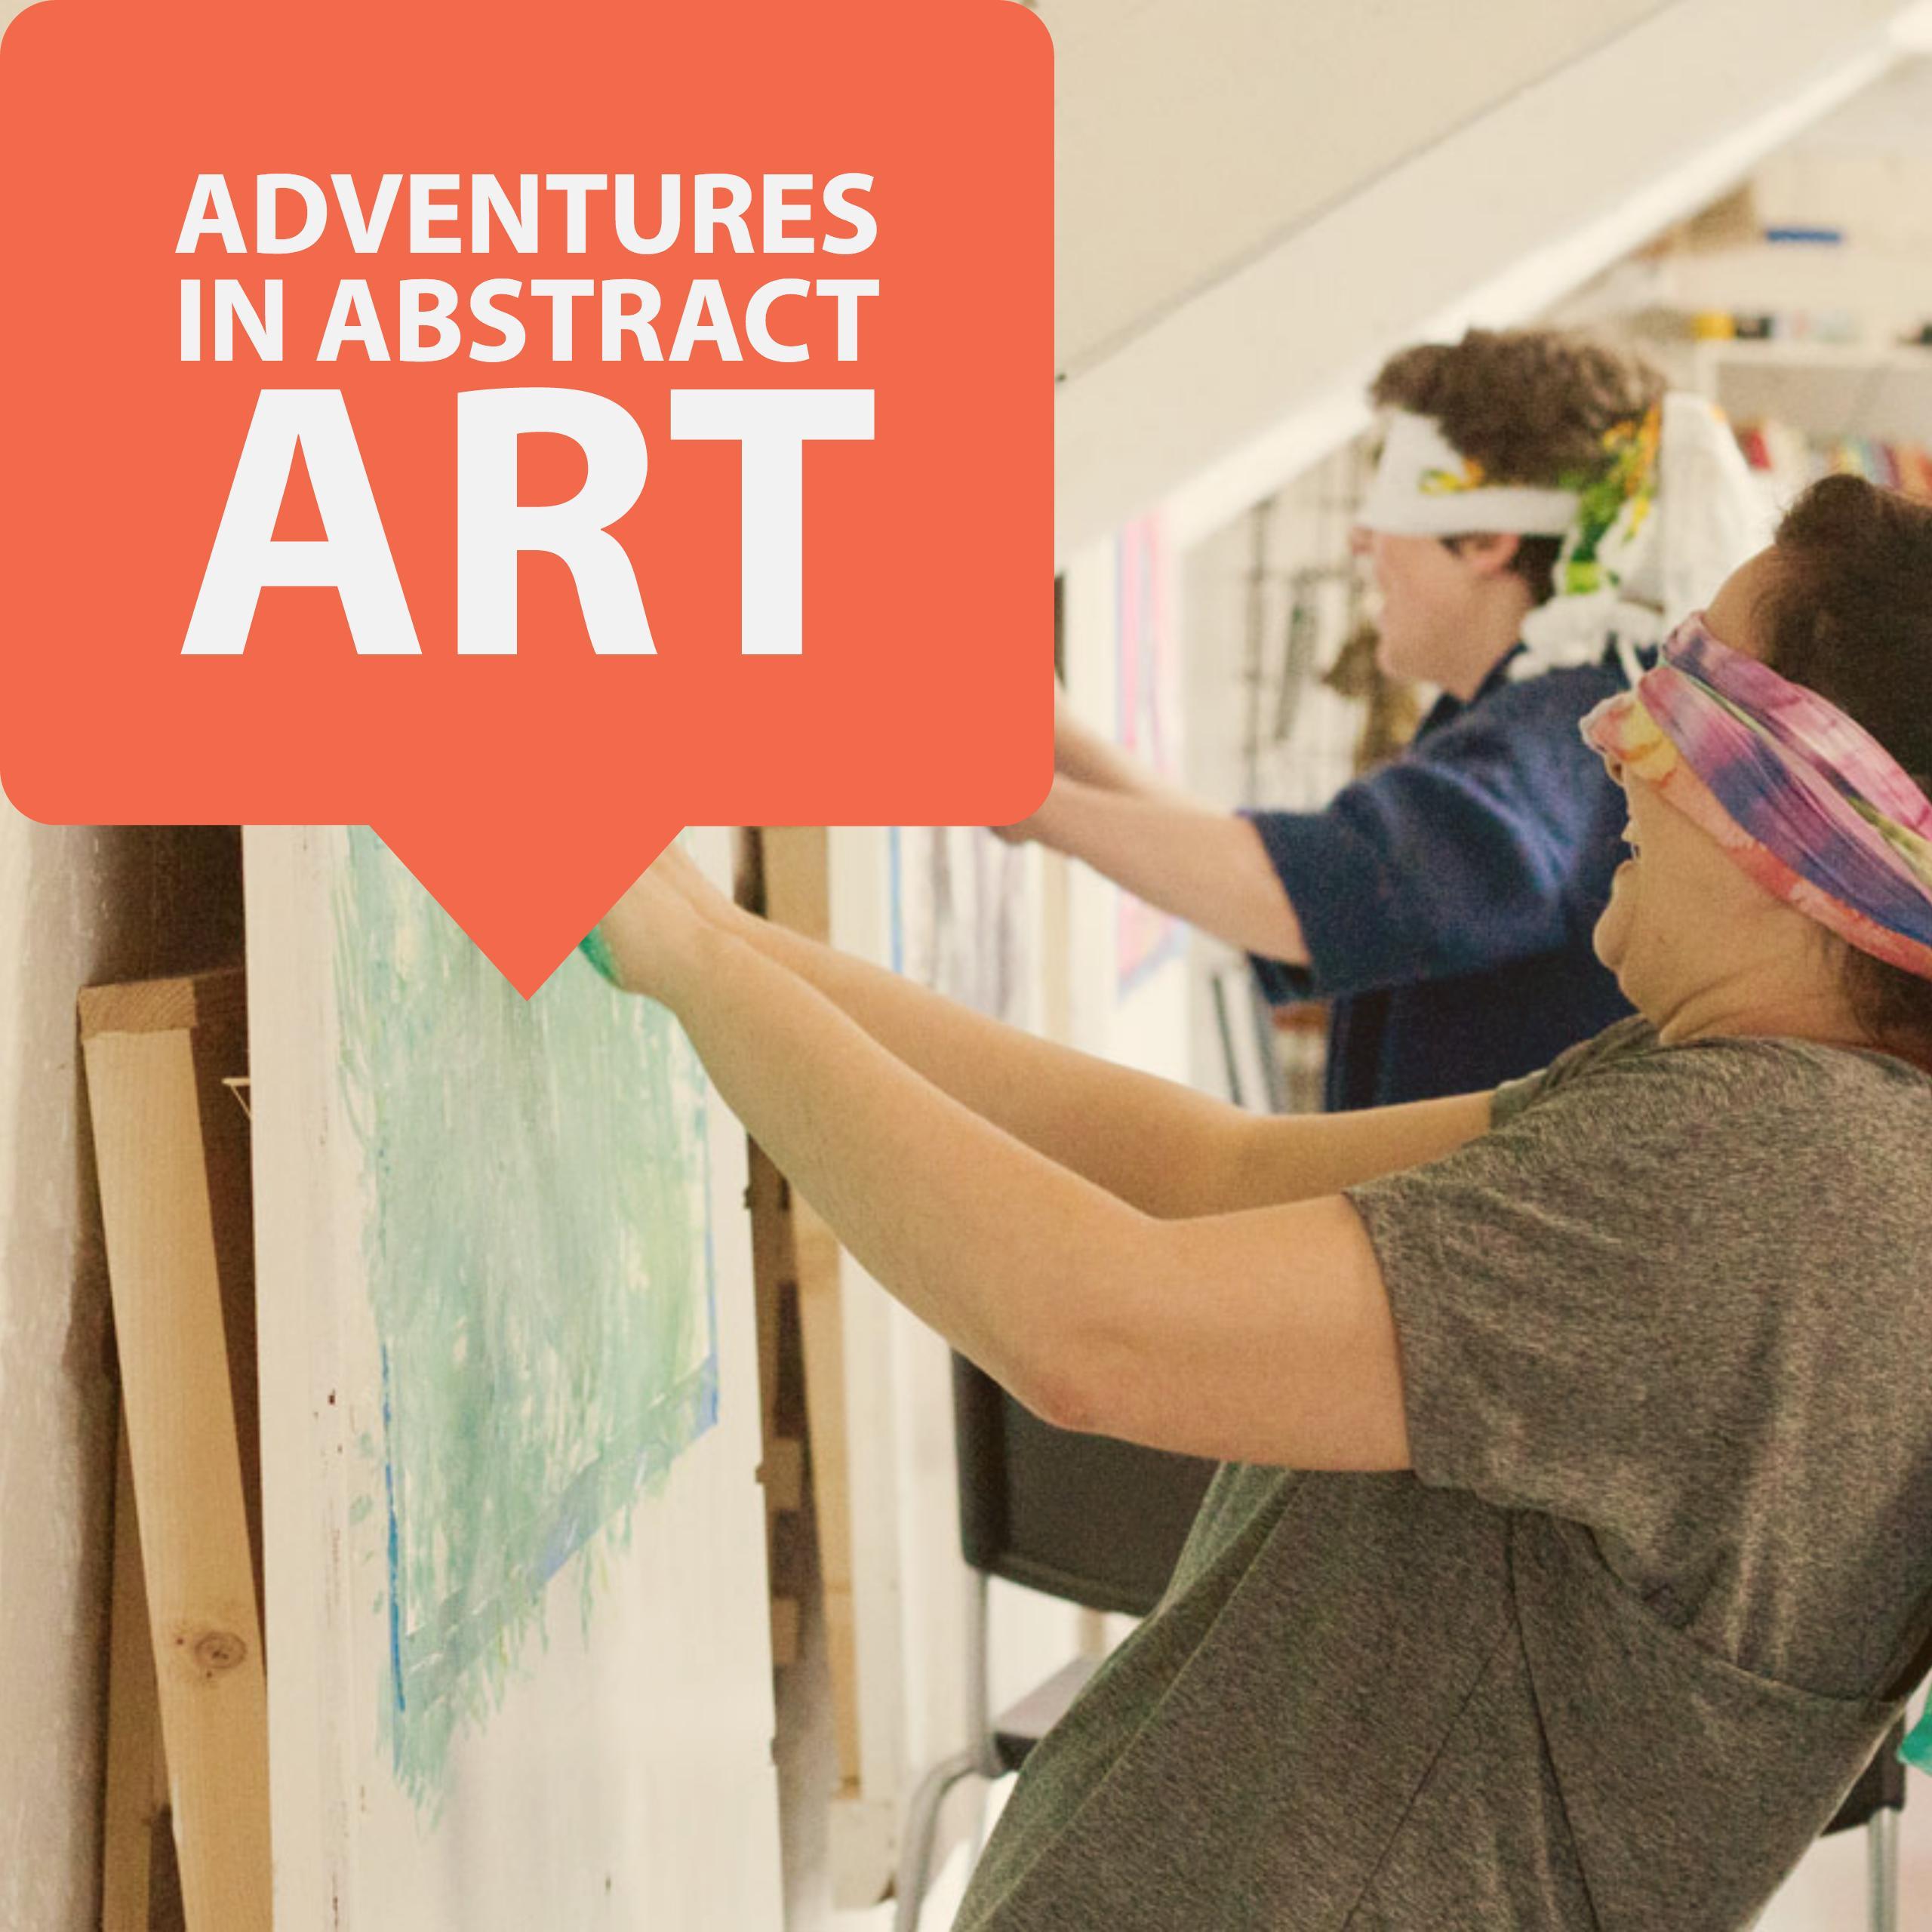 Adventures in Abstract Art, Galway Arts Week, 22-23 July